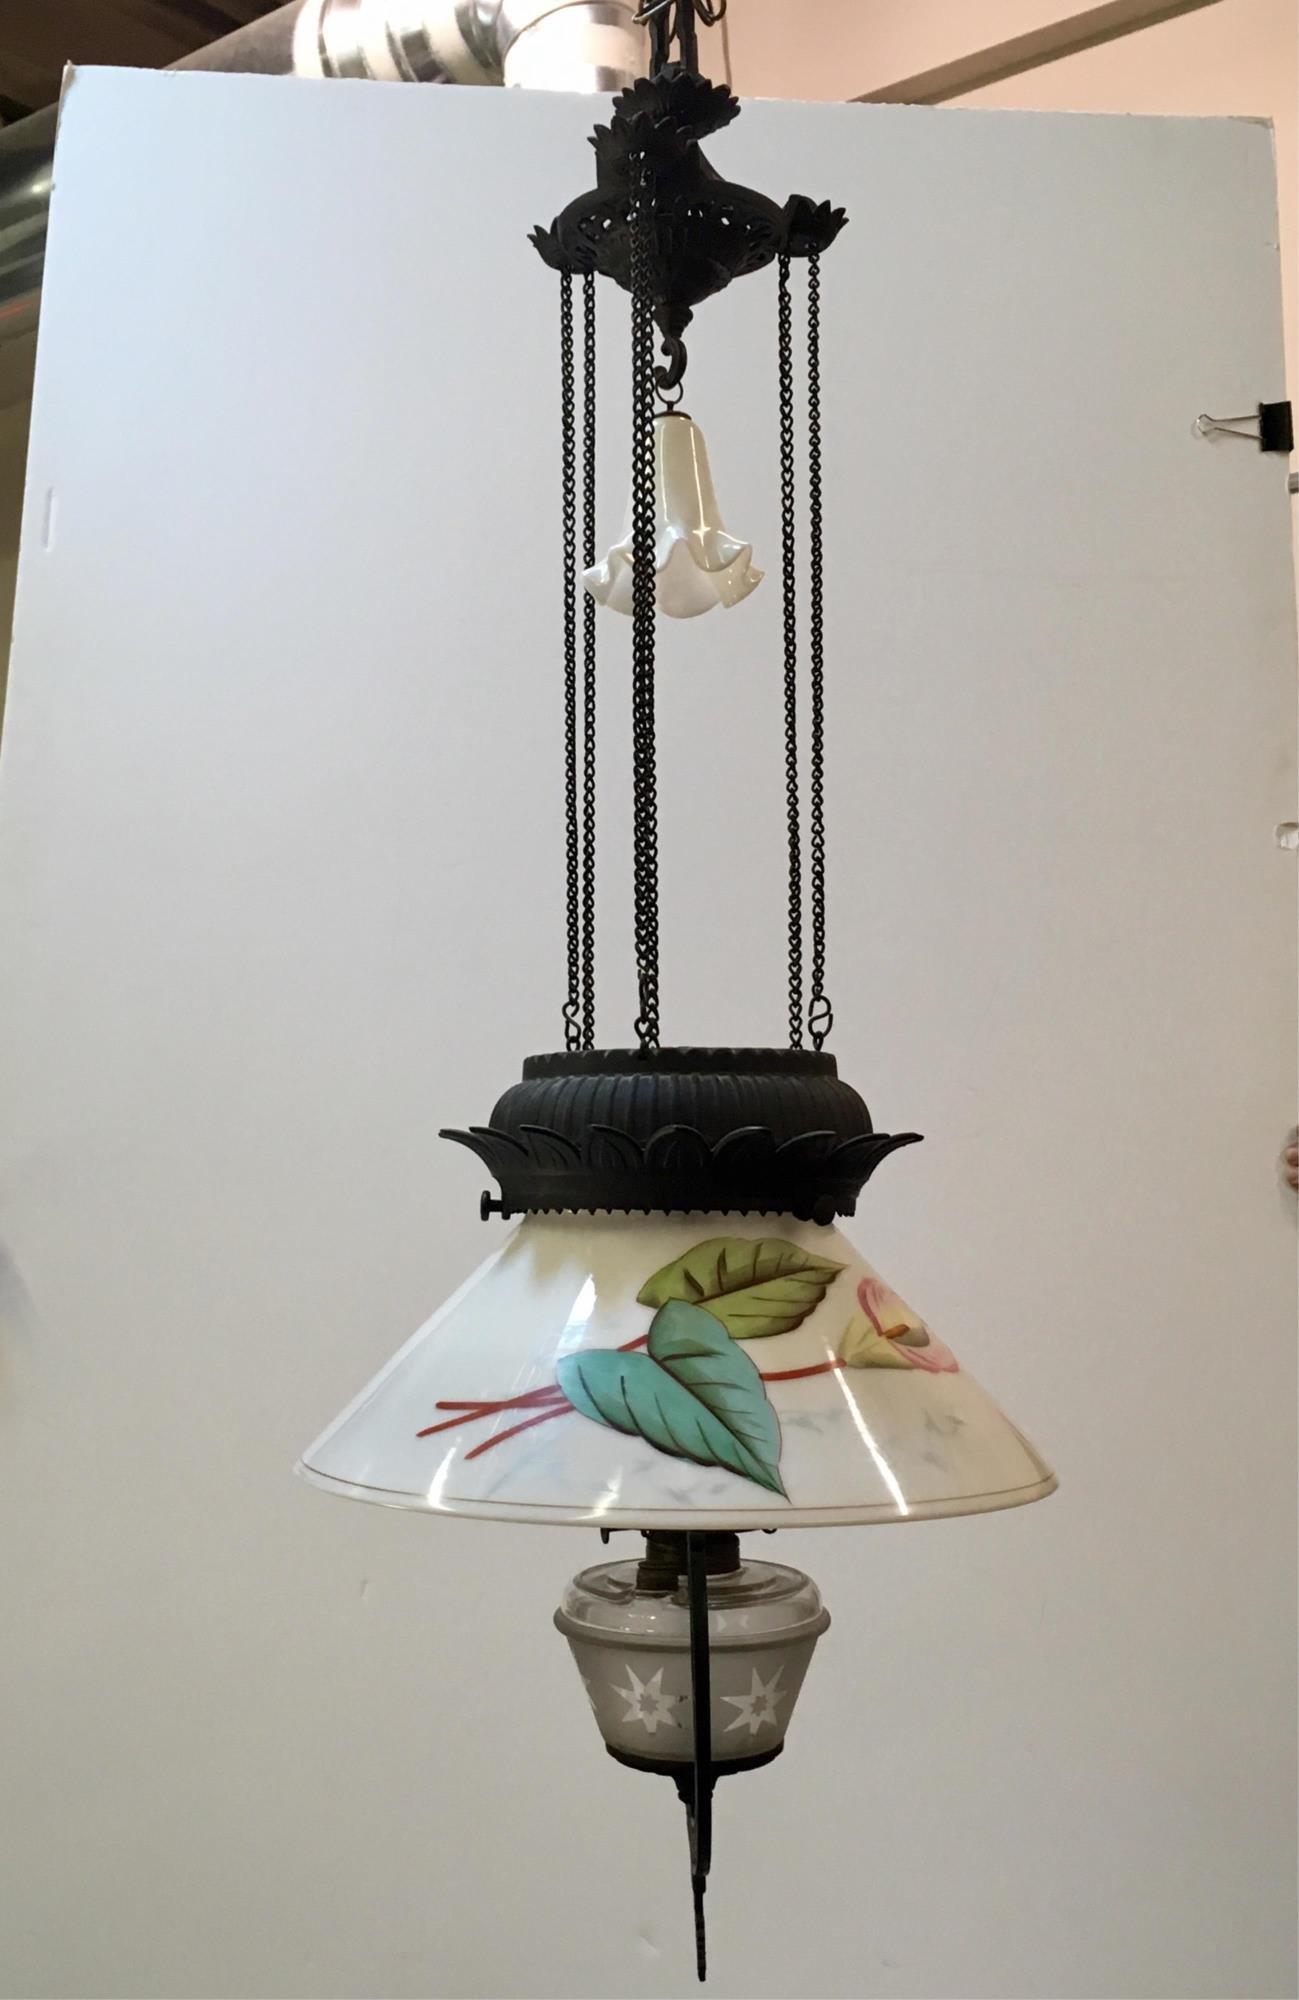 VICTORIAN ERA WROUGHT IRON HANGING OIL LAMP